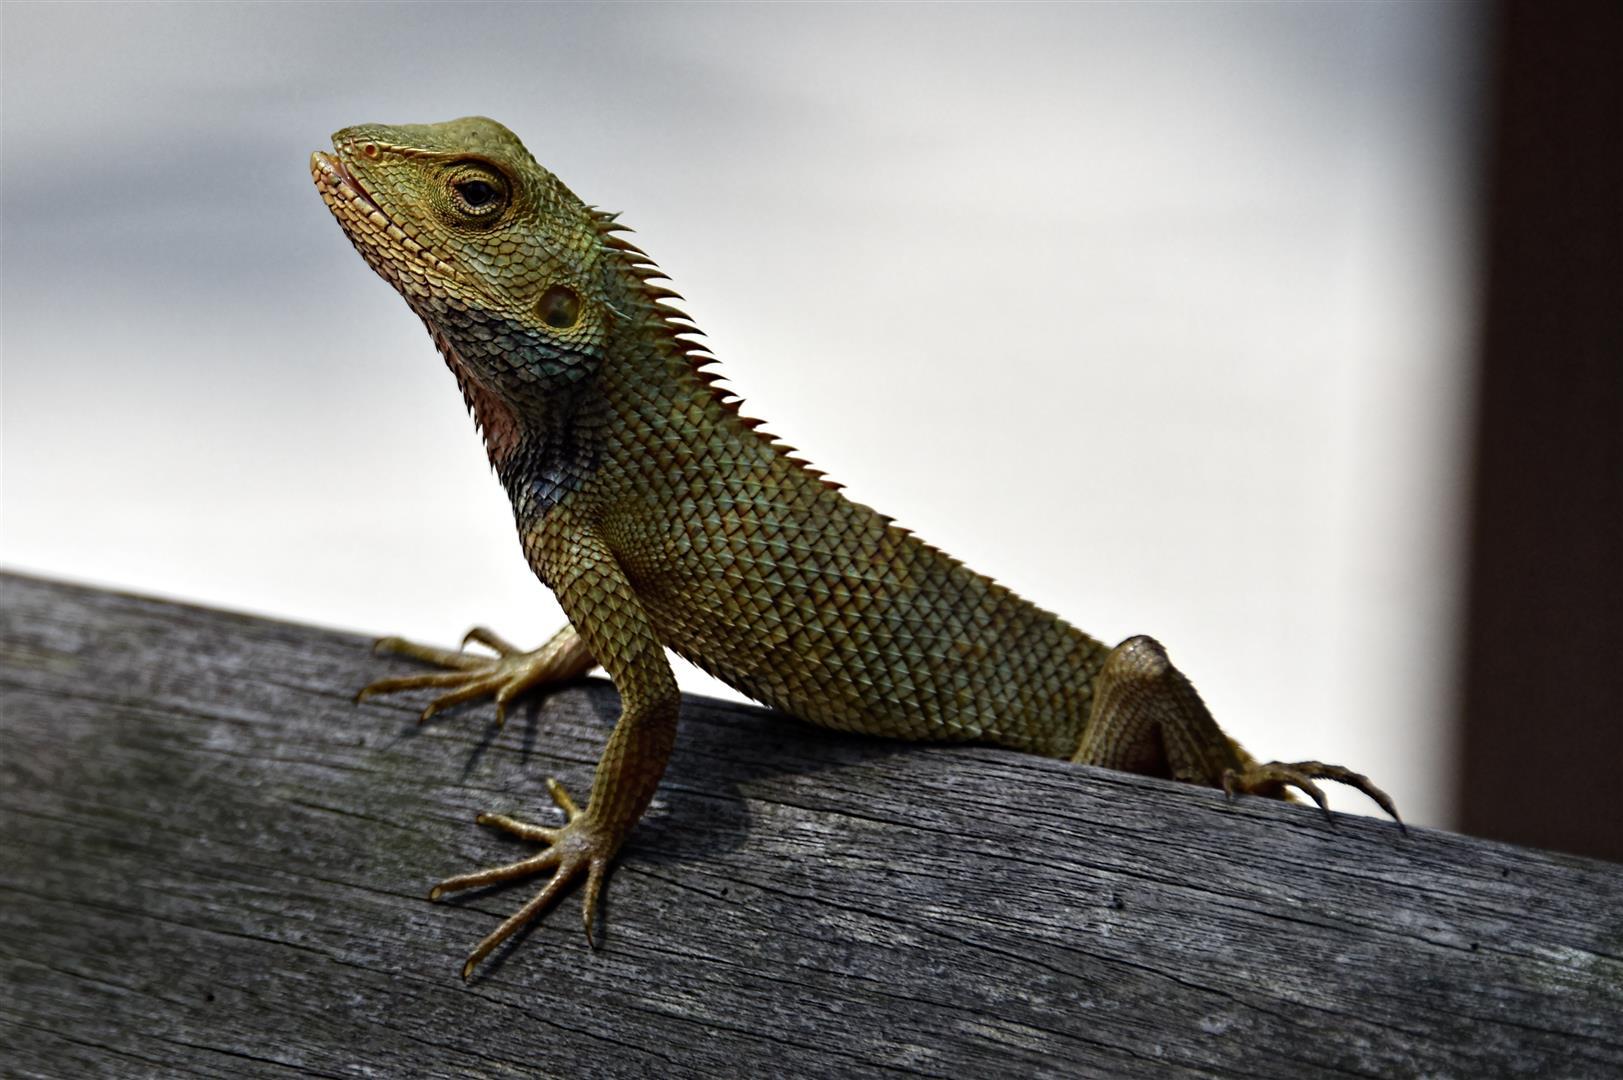 Sungei Buloh Lizard (1)